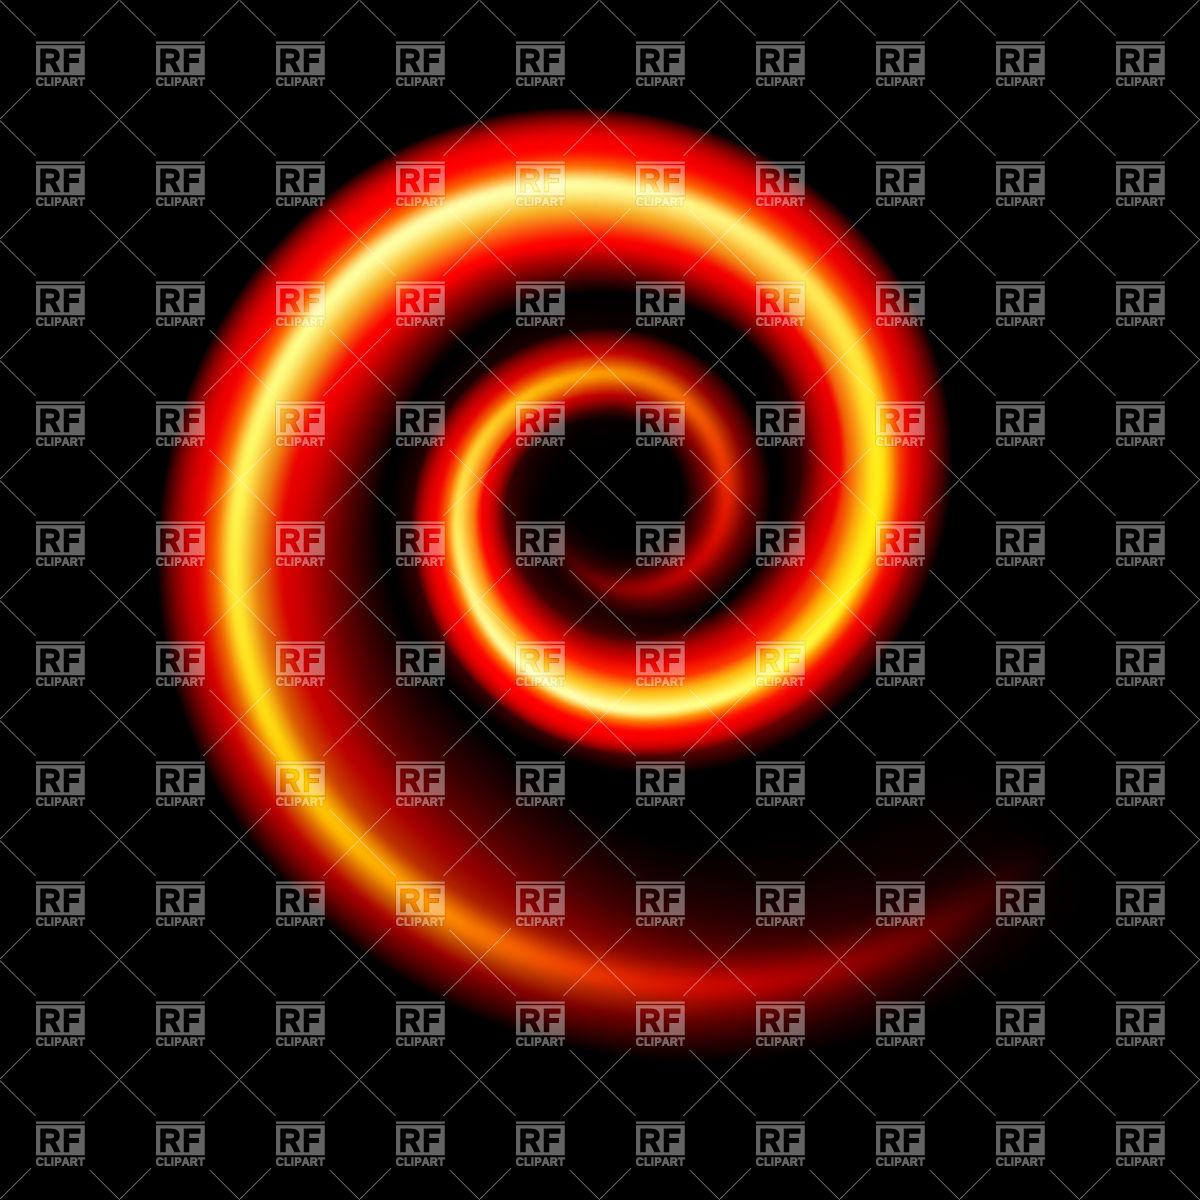 Neon Clipart Download.